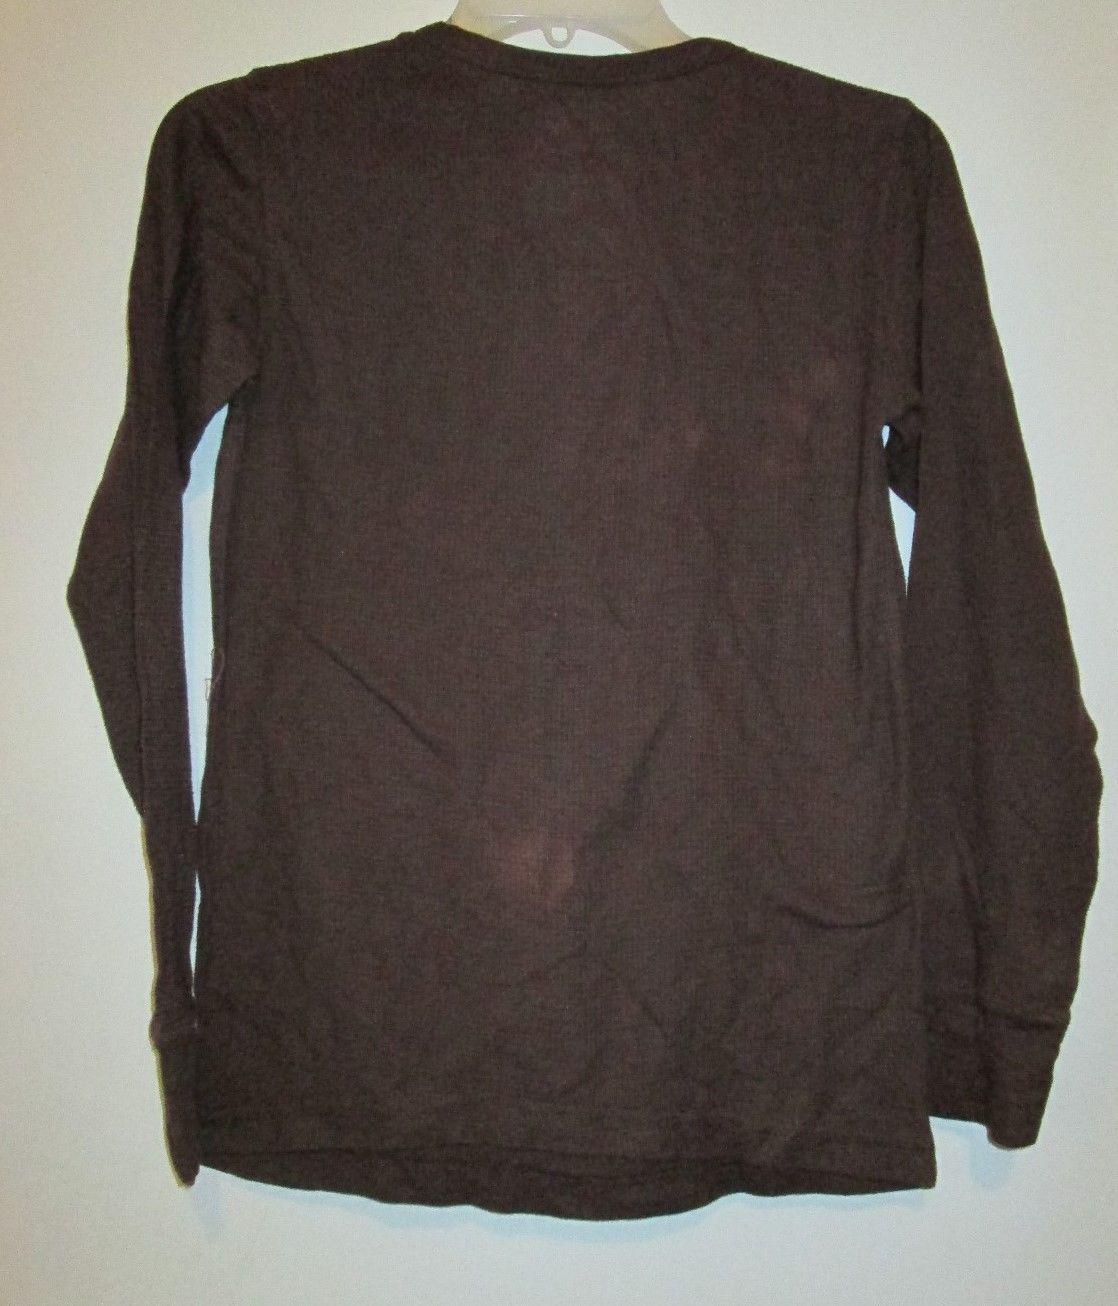 jimi hendrix rockstar retro brown long sleeve thermal tee shirt size medium 6 8